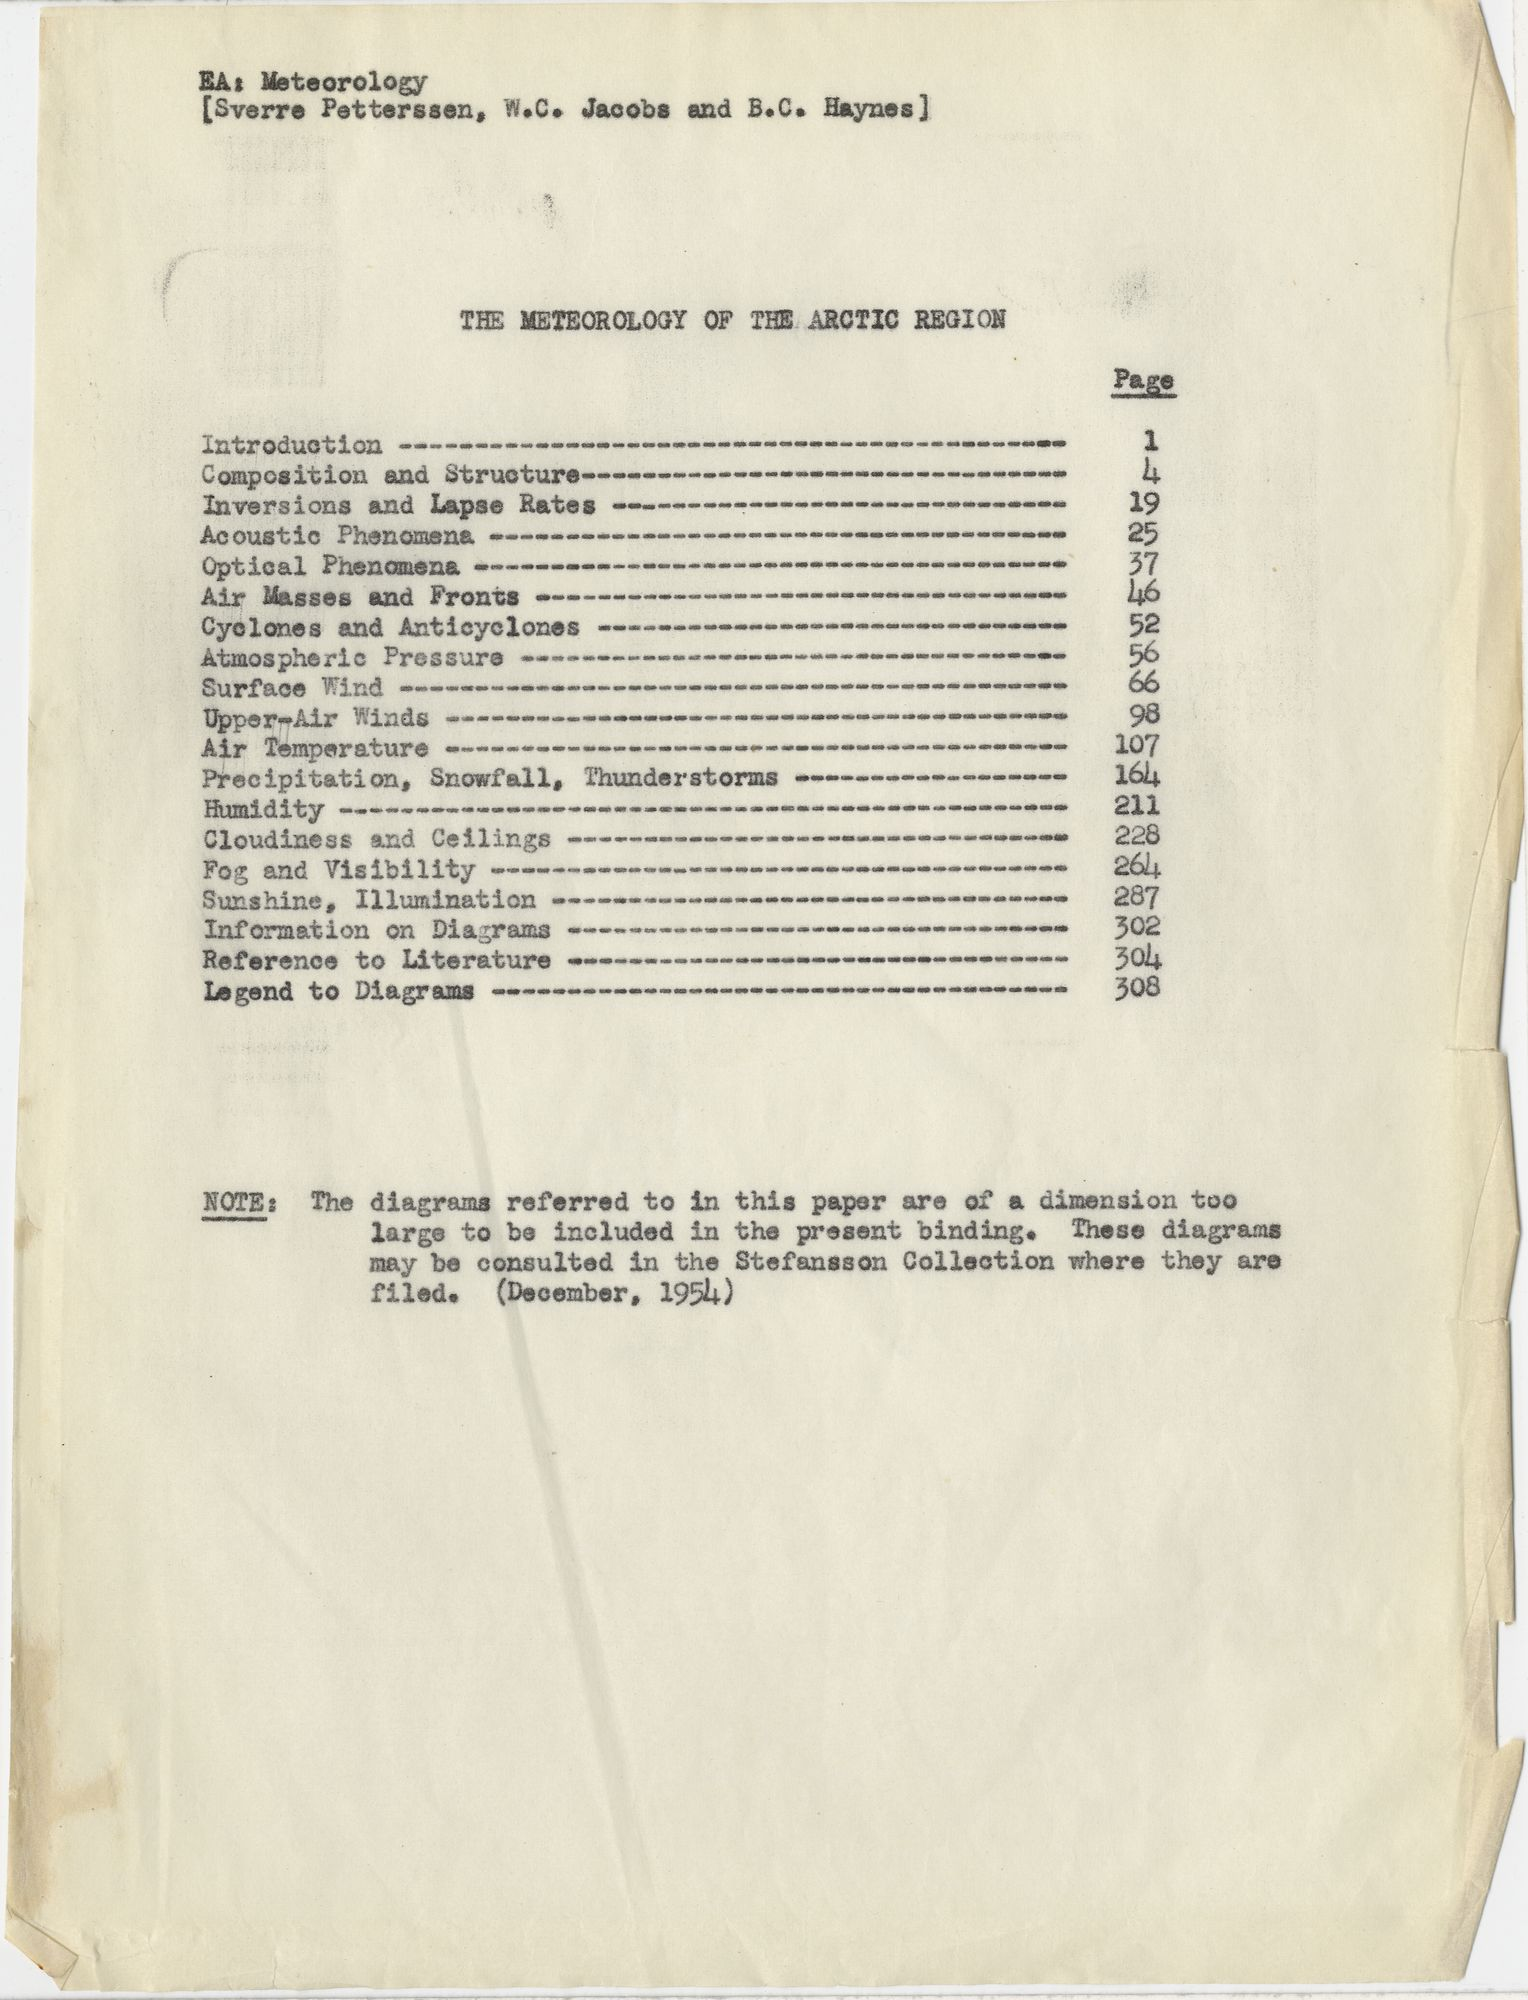 The Meteorology Of Arctic Region Encyclopedia Arctica 7 Polar 4 Stroke Engine Diagram And Oceanography